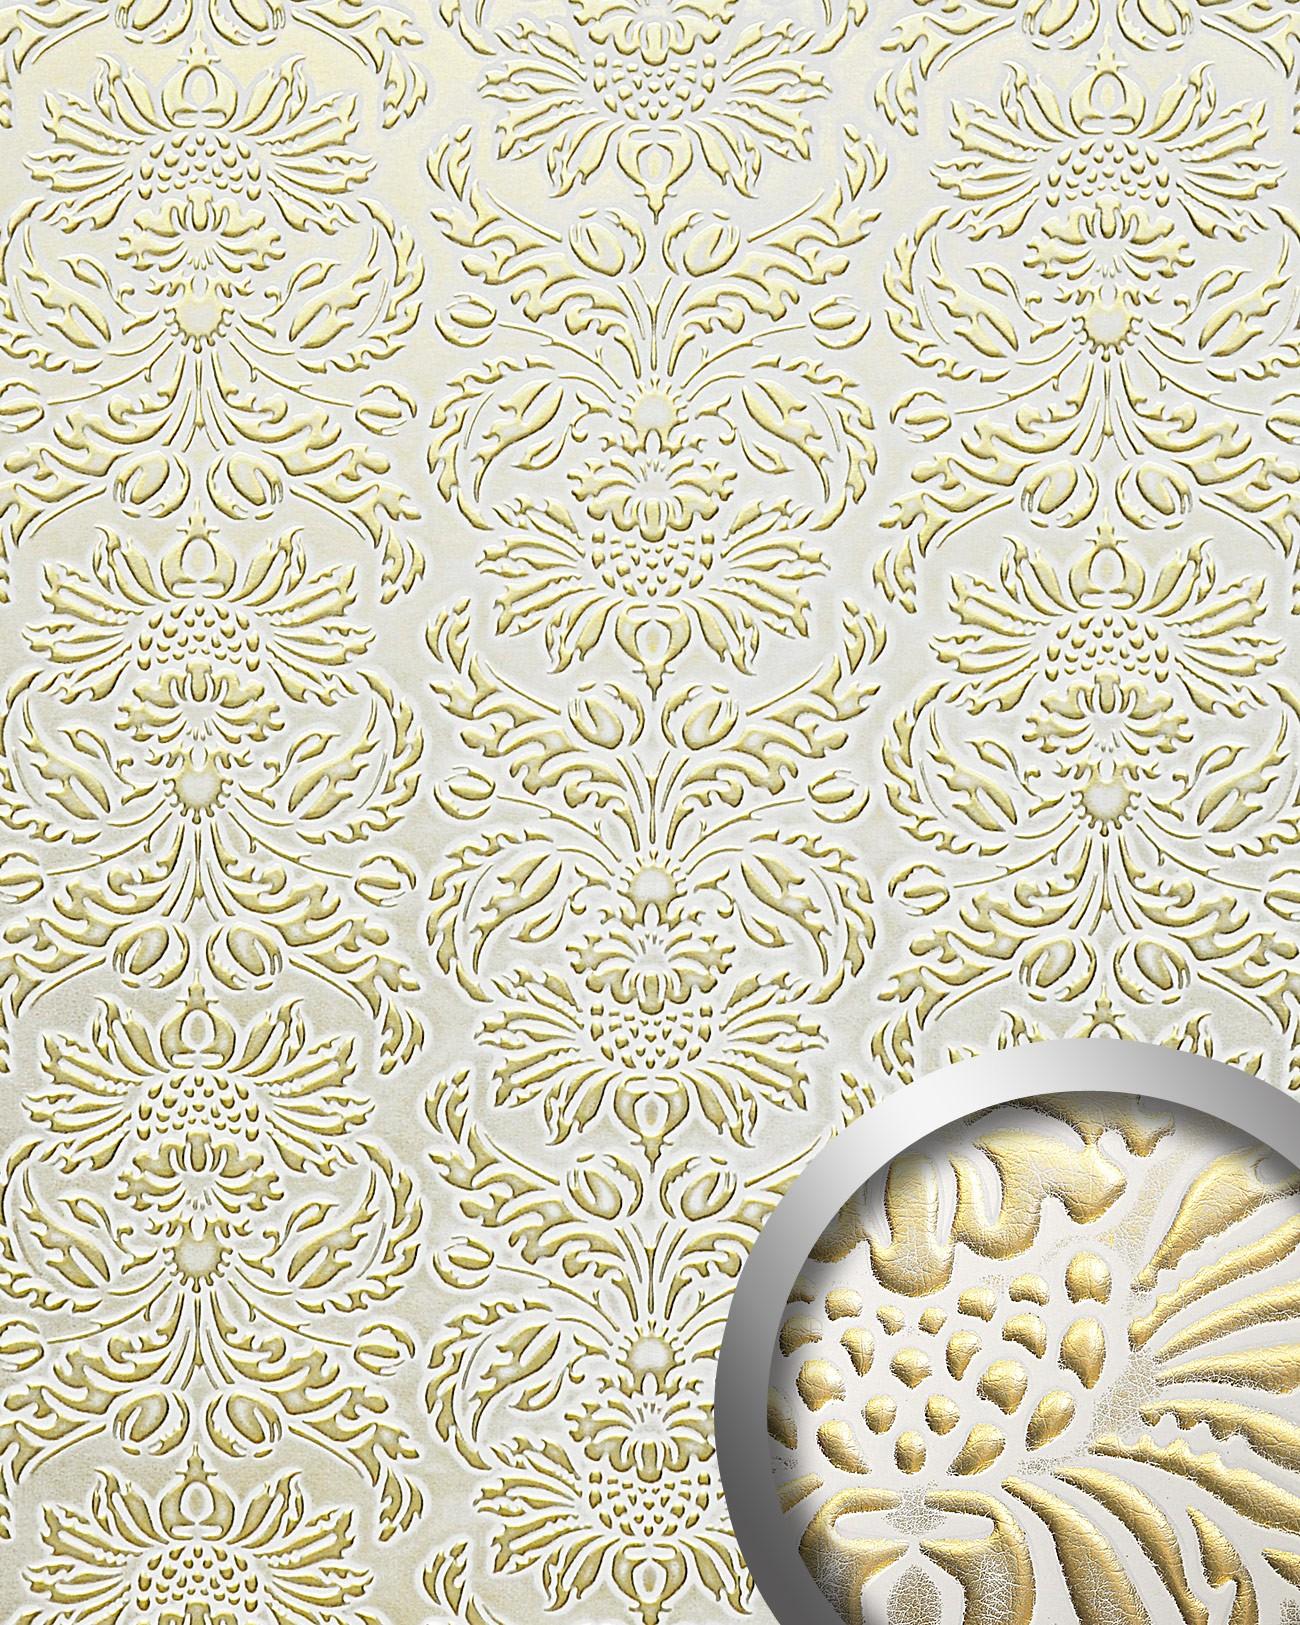 Wandpaneel Luxus 3d Wallface 14793 Imperial Leder Dekor Barock